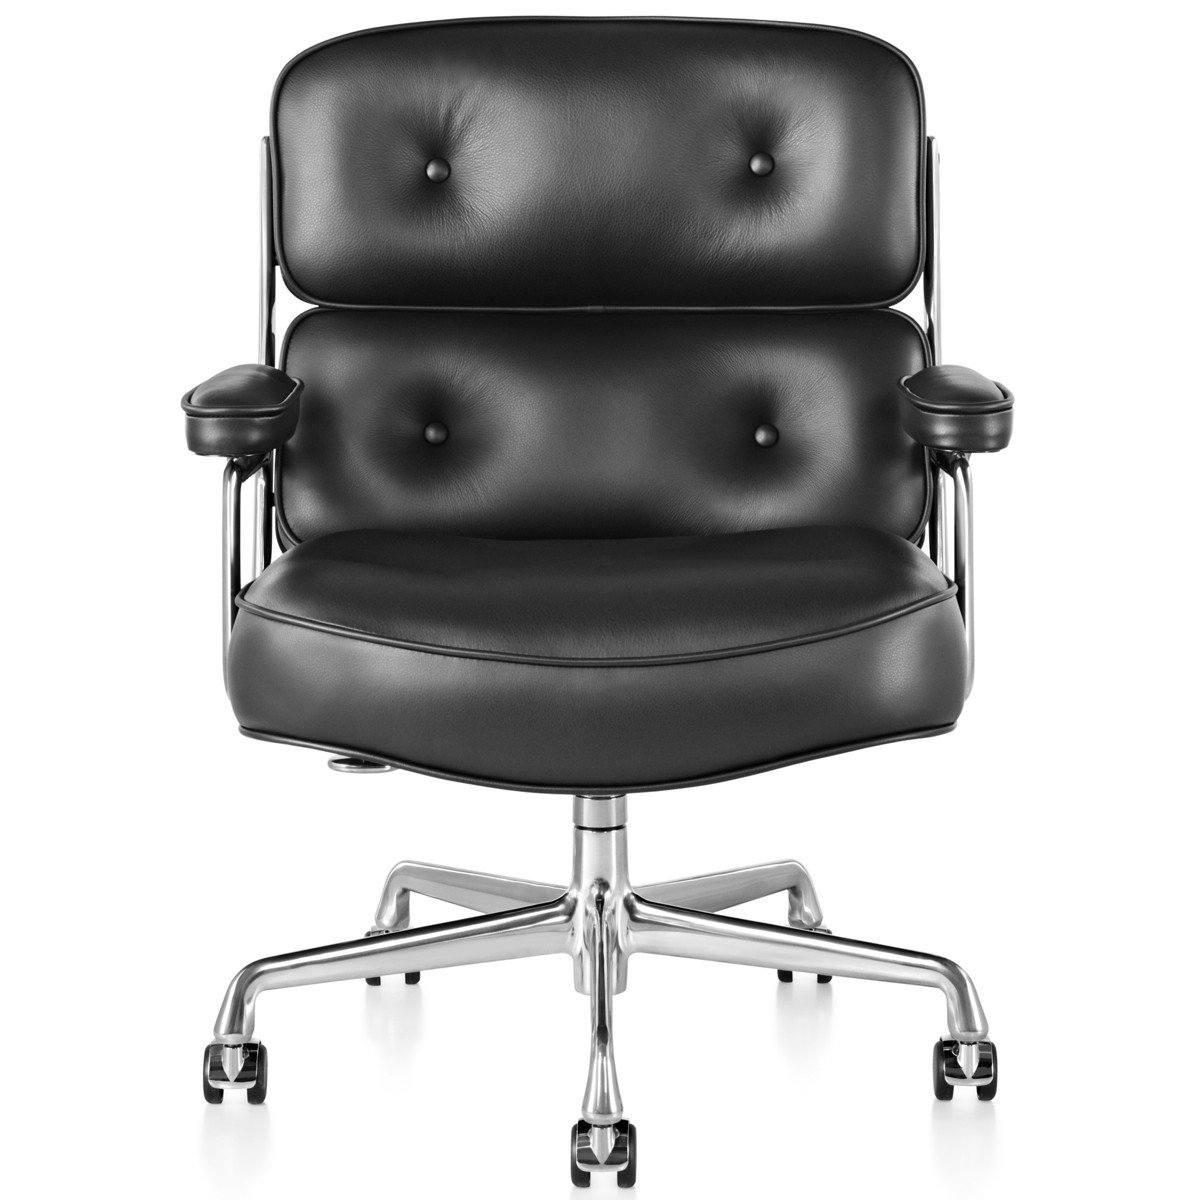 Eames TimeLife Executive Chair